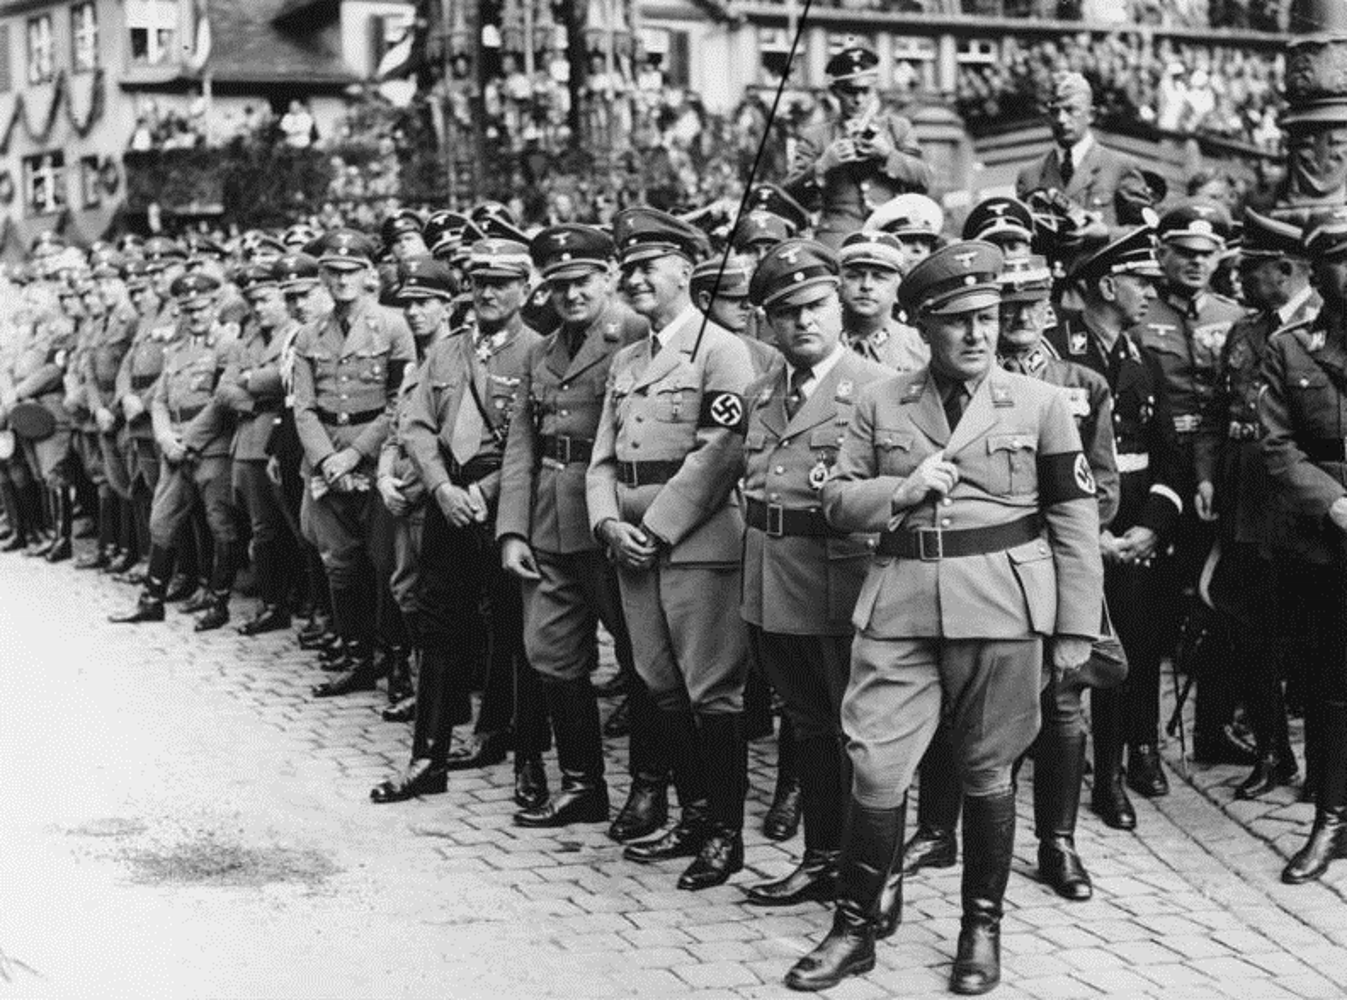 Nazi Party Nuremberg Rally 1938